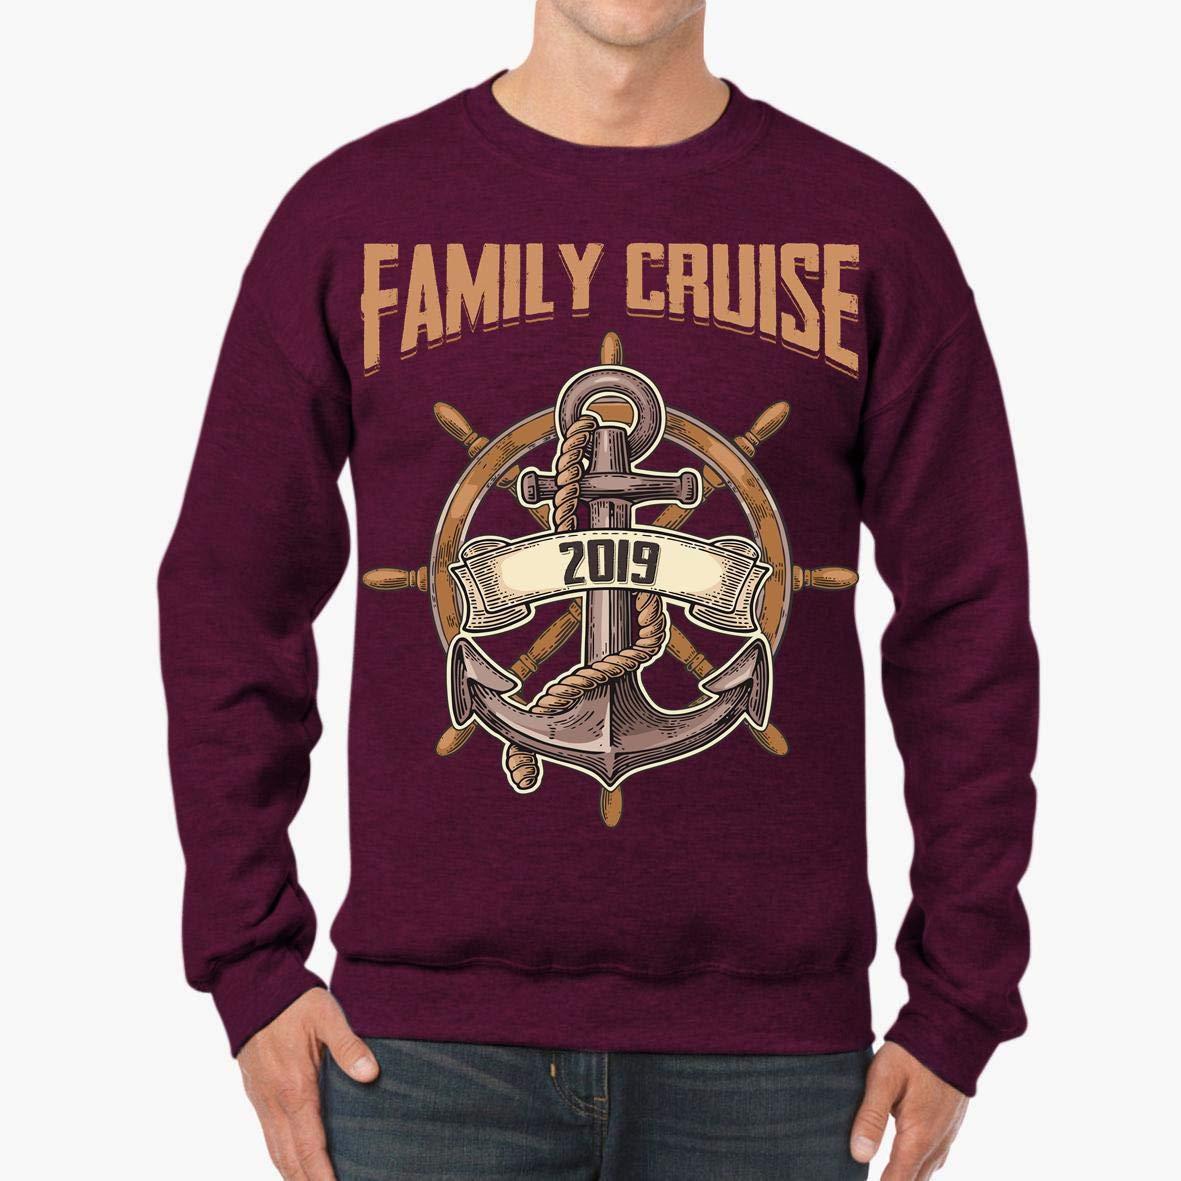 tee 2019 Matching Family Cruise Unisex Sweatshirt